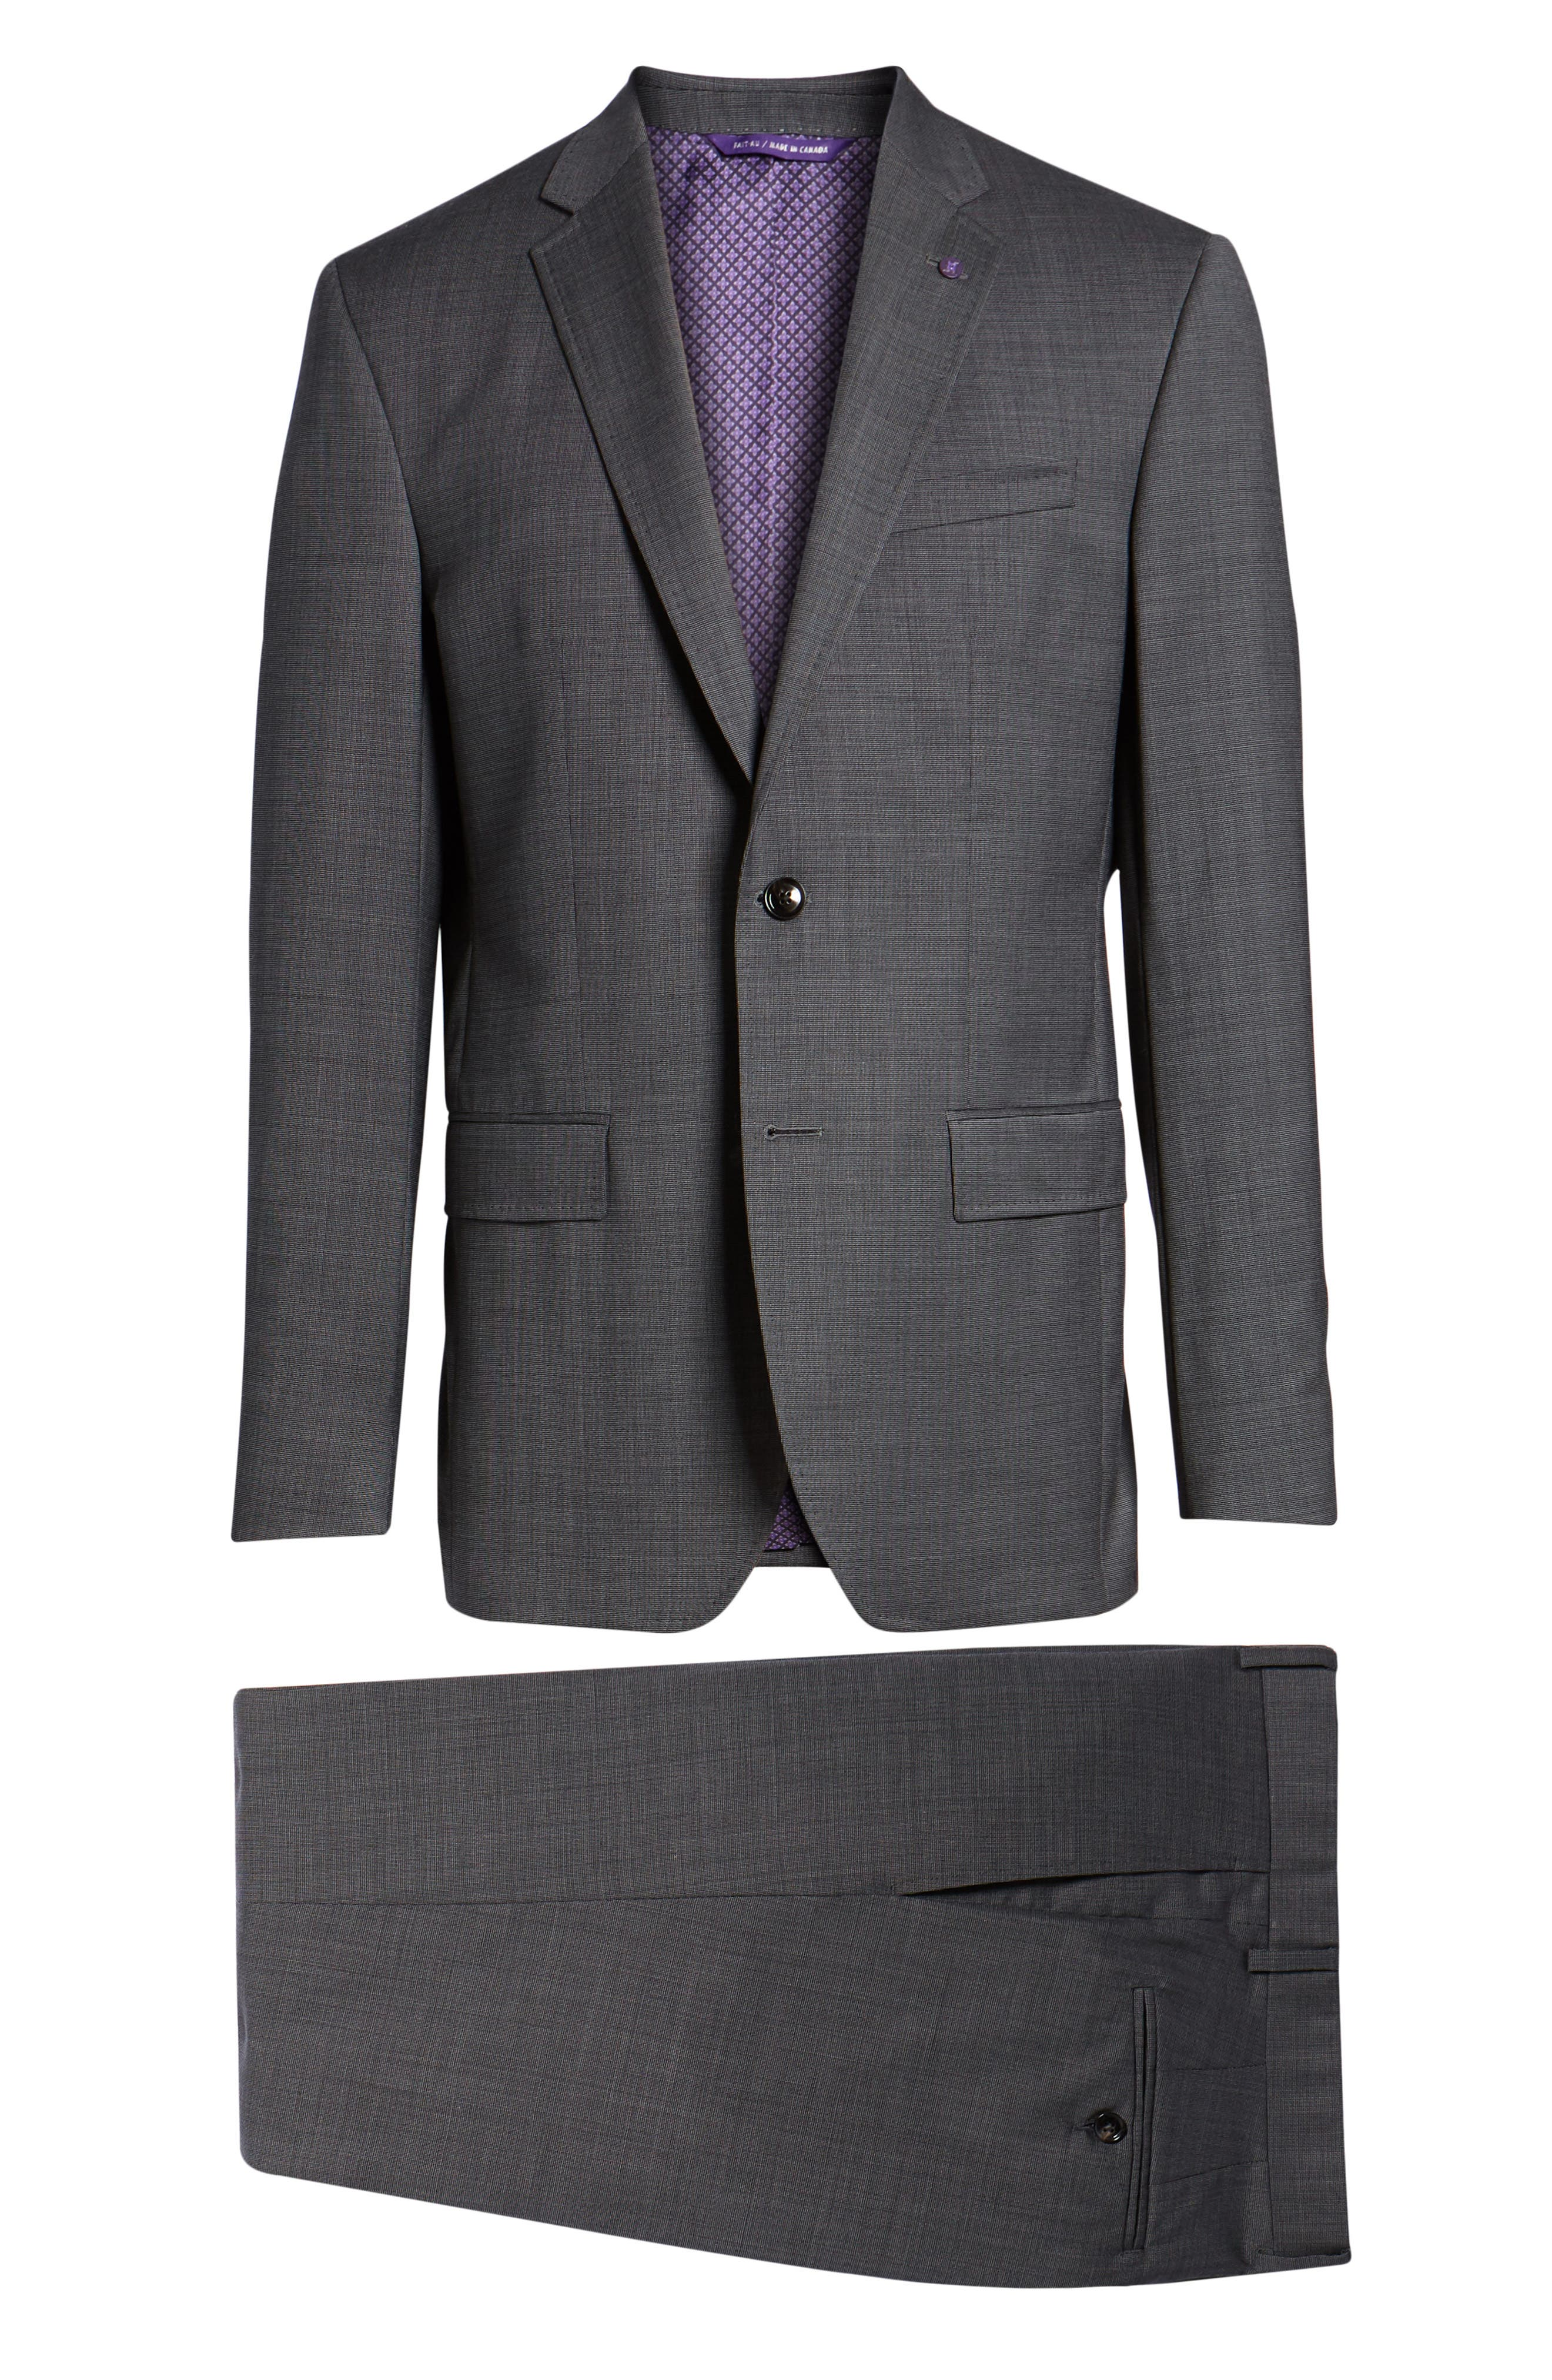 Jay Trim Fit Solid Wool Suit,                             Alternate thumbnail 8, color,                             020